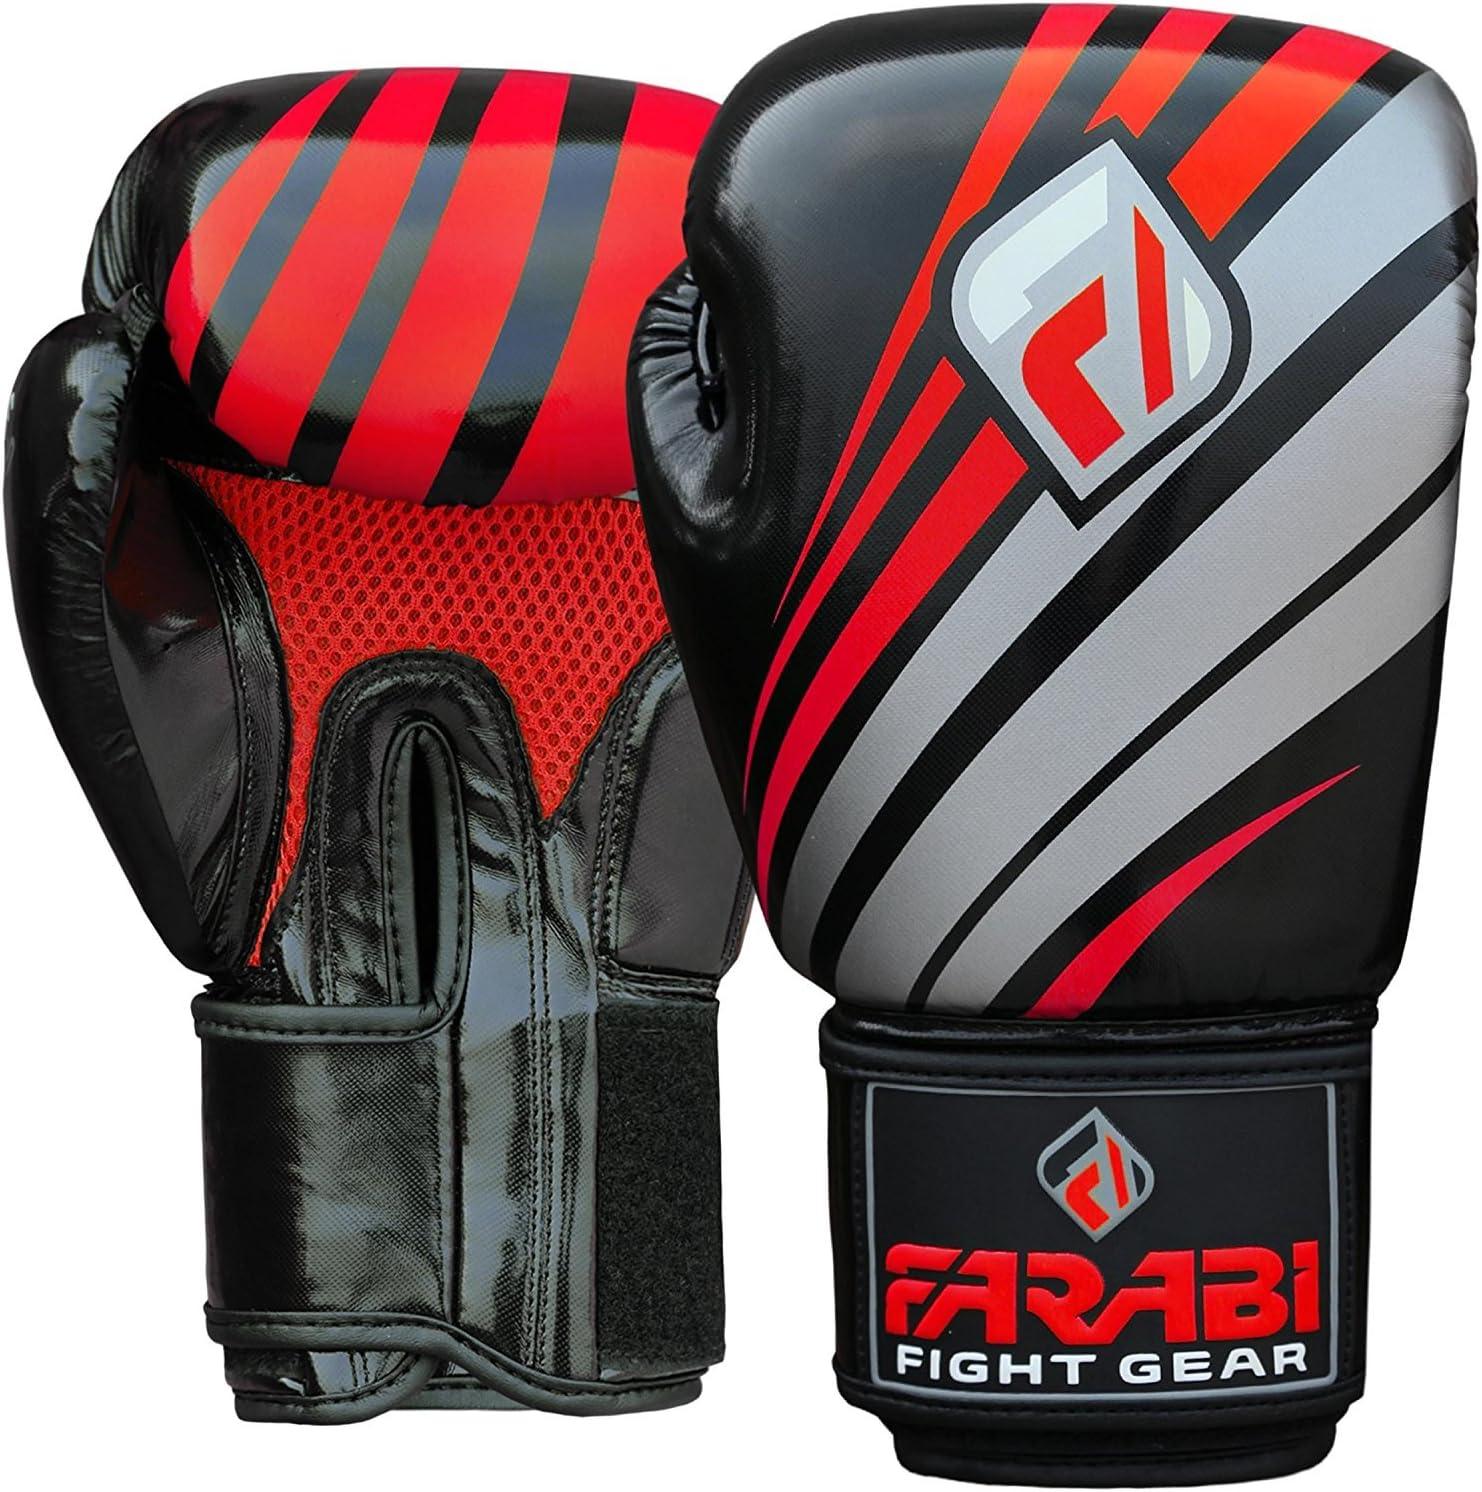 Farabi FAR-TECH Boxing Gloves 10oz 12oz 14oz 16oz Boxing Gloves for Training Punching Sparring Punching Bag Boxing Bag Gloves Punch Bag Mitts Muay Thai Kickboxing MMA Martial Arts Workout Gloves Boxing gloves Men Boxing Training Gloves